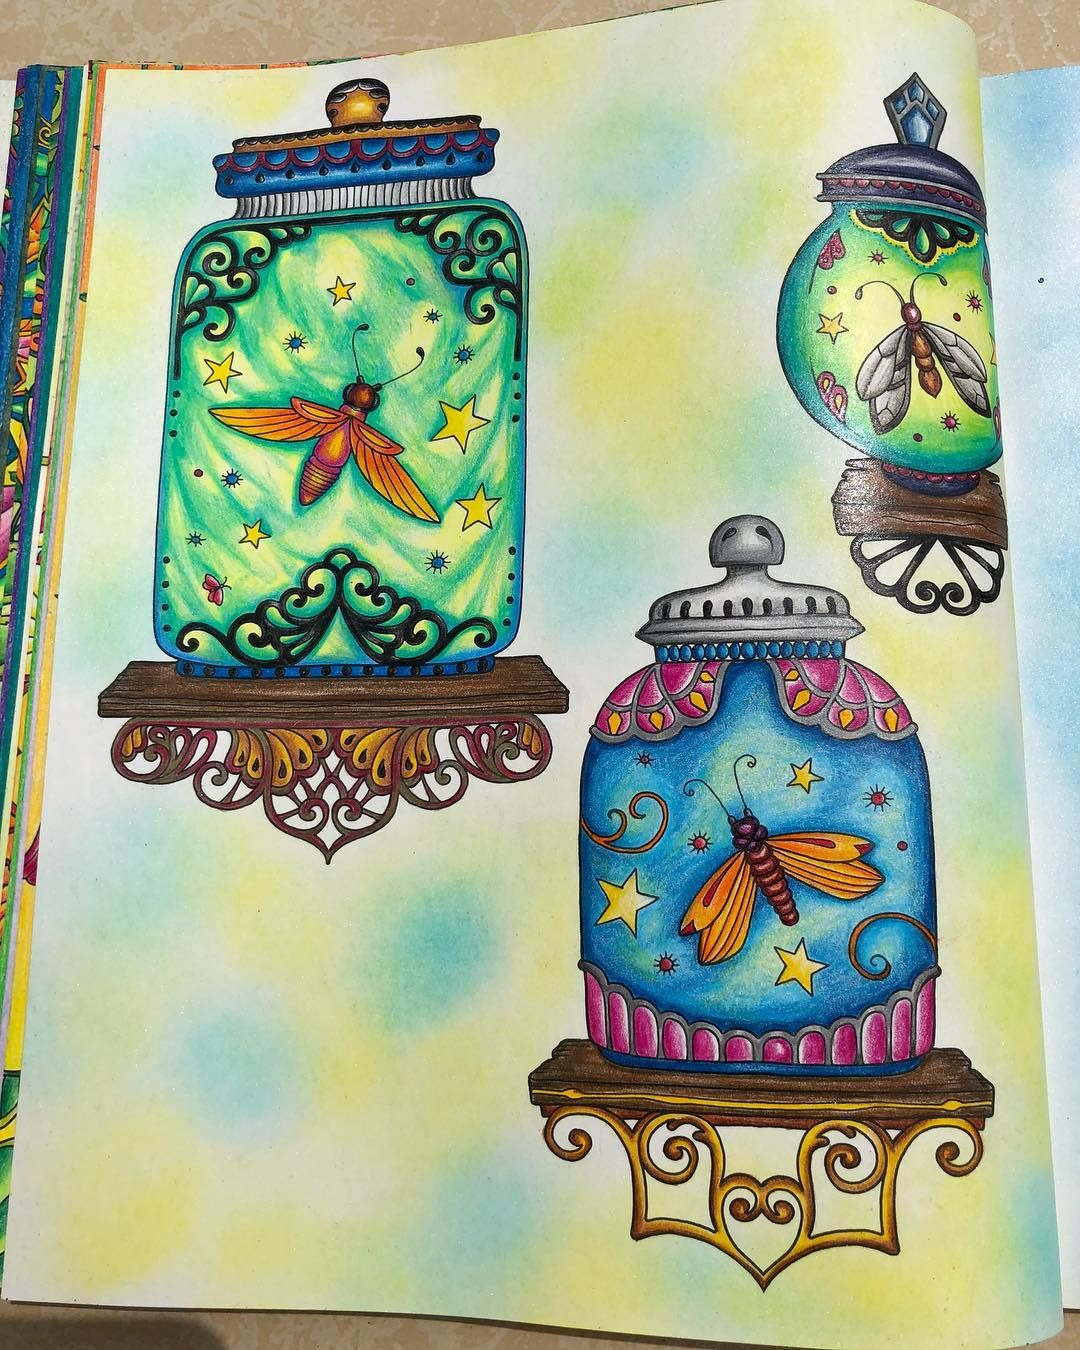 #ivyandtheinkybutterfly | Johanna basford coloring book ...